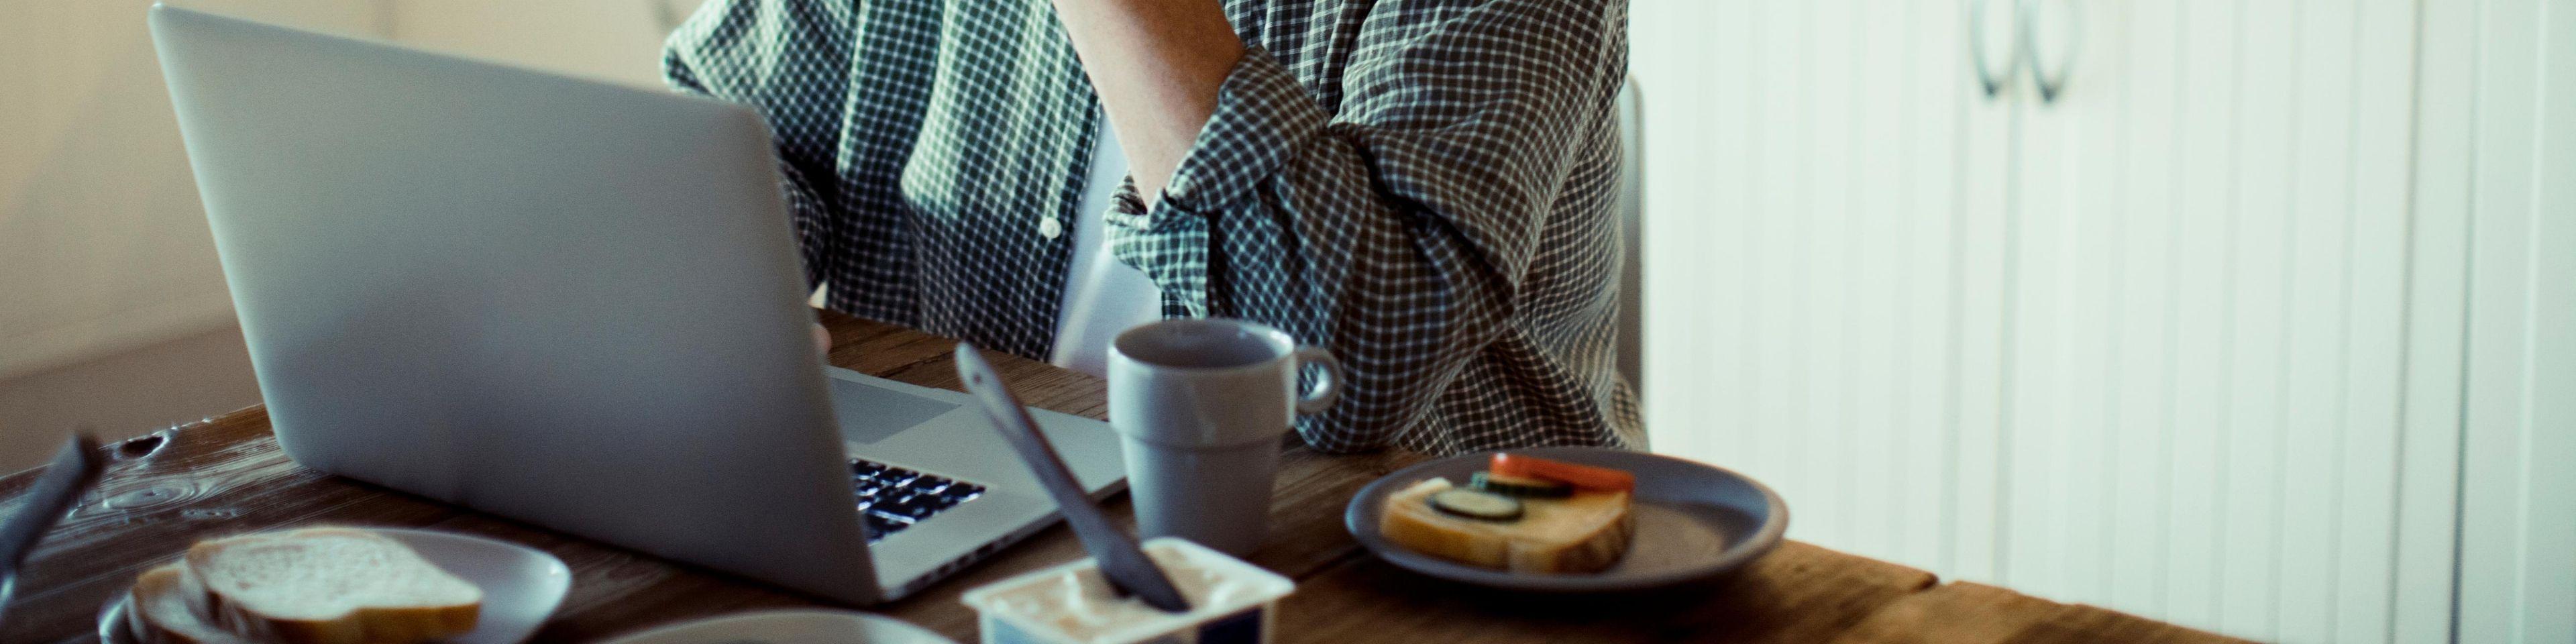 Kleos-Office365-tips1-NL